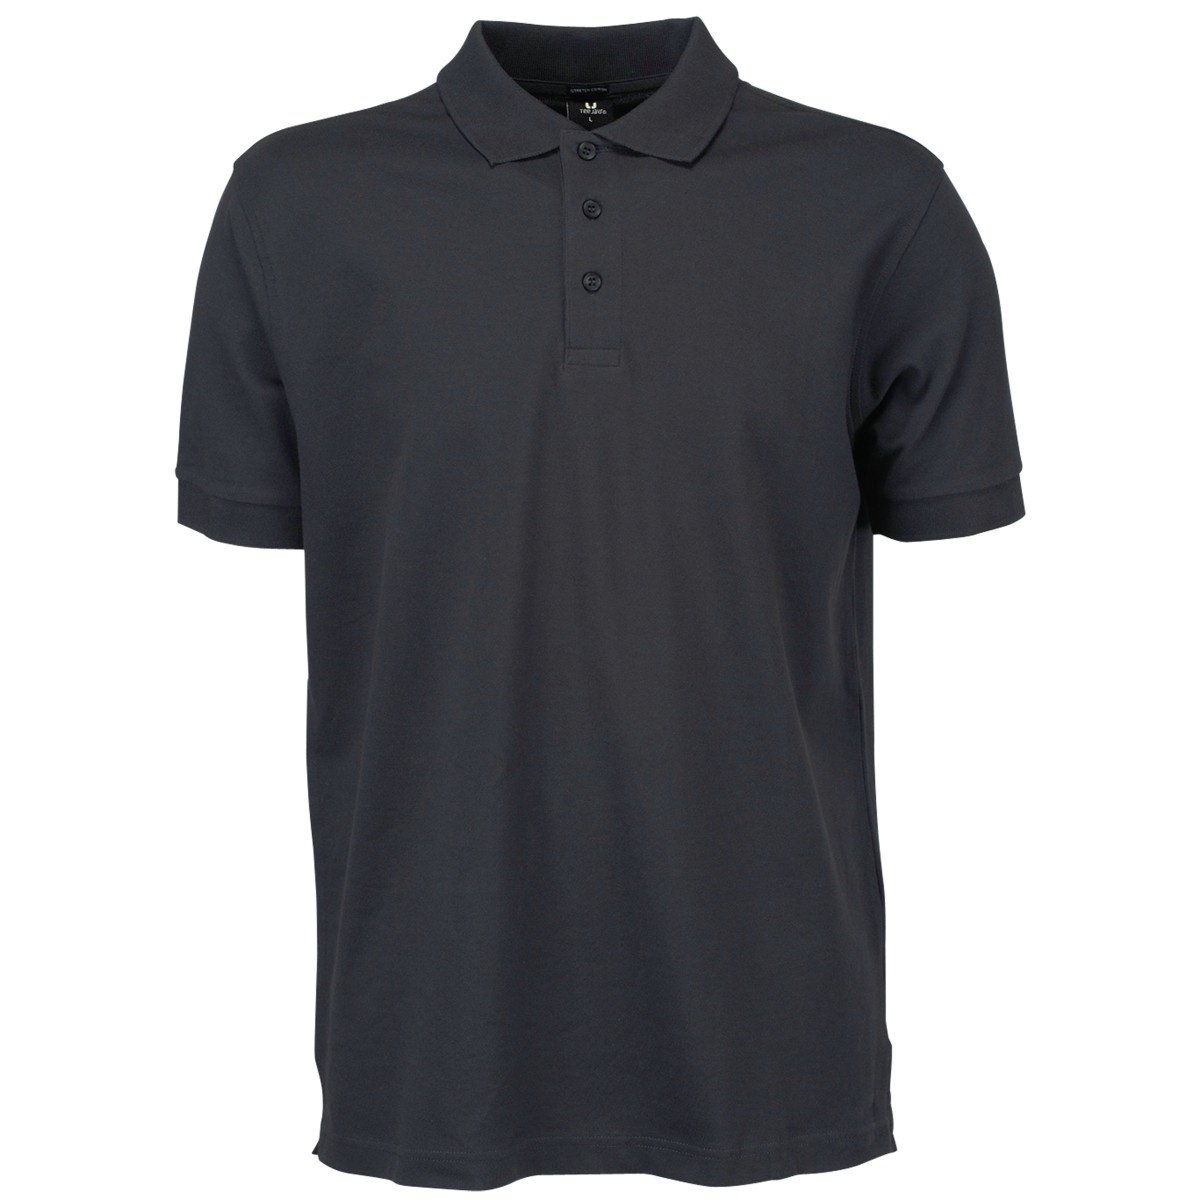 Tee Jays Mens Luxury Stretch Short Sleeve Polo Shirt (3XL) (Black)